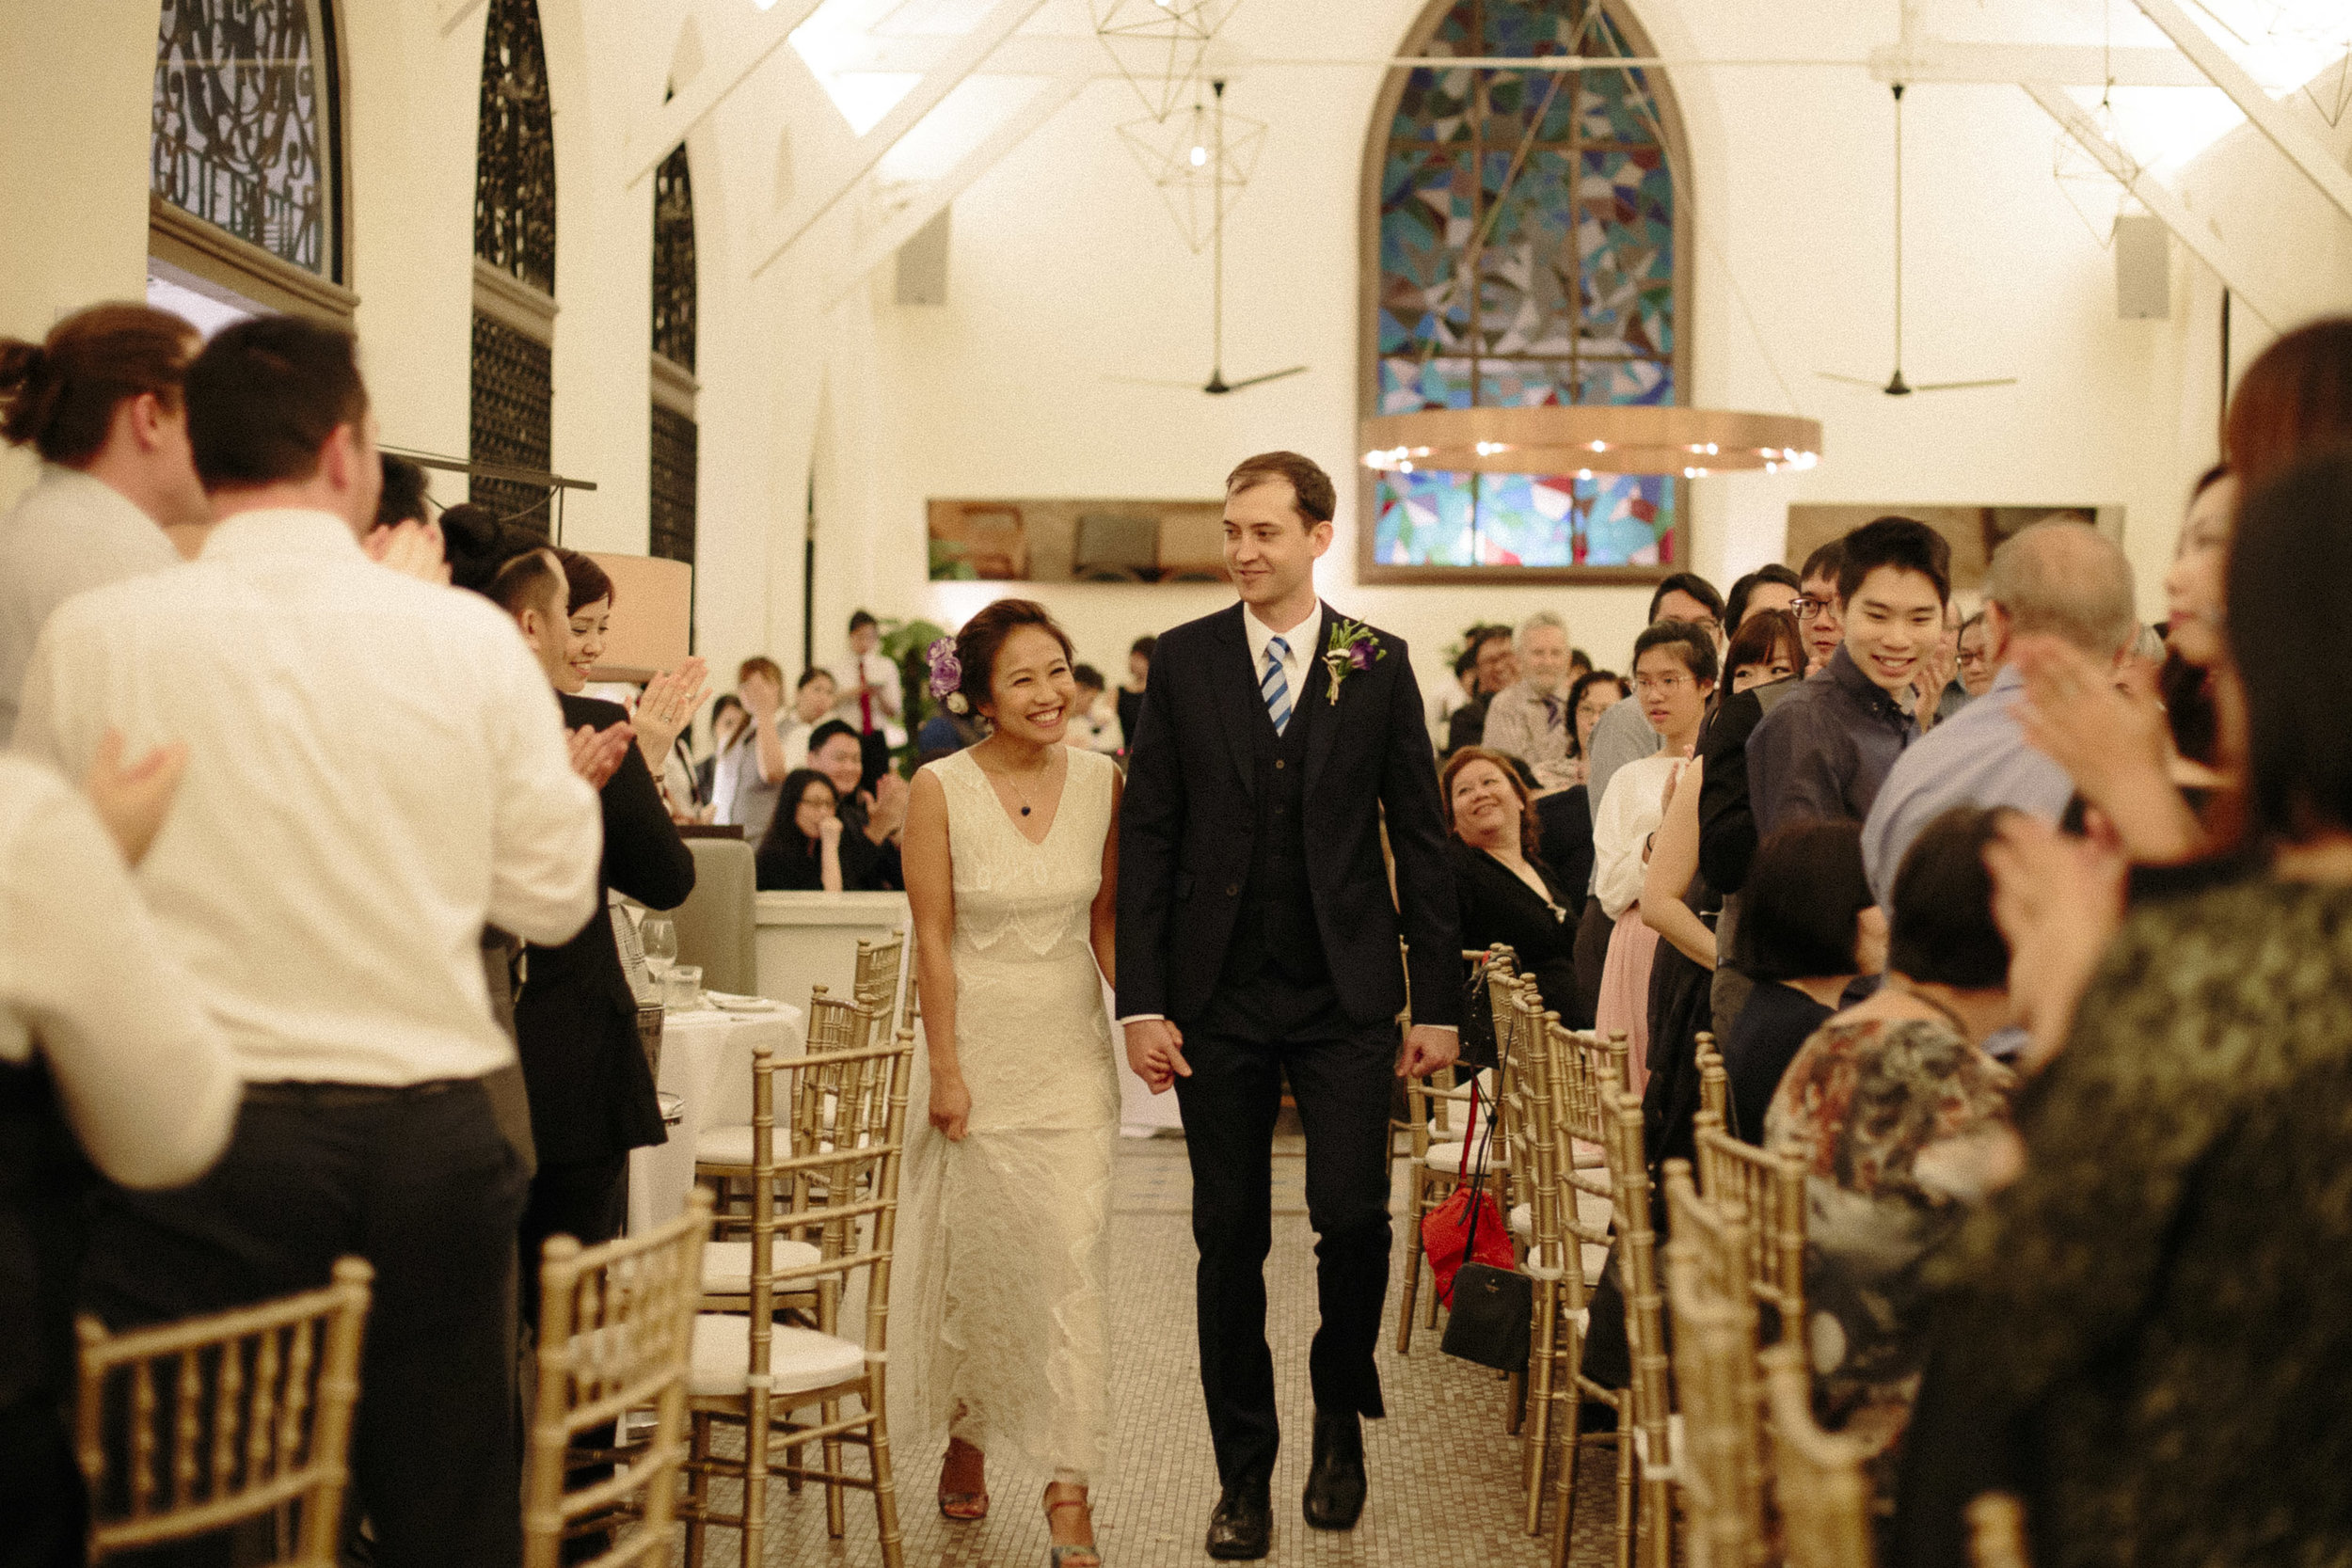 singapore-wedding-photographer-hiram-joyce-059.jpg